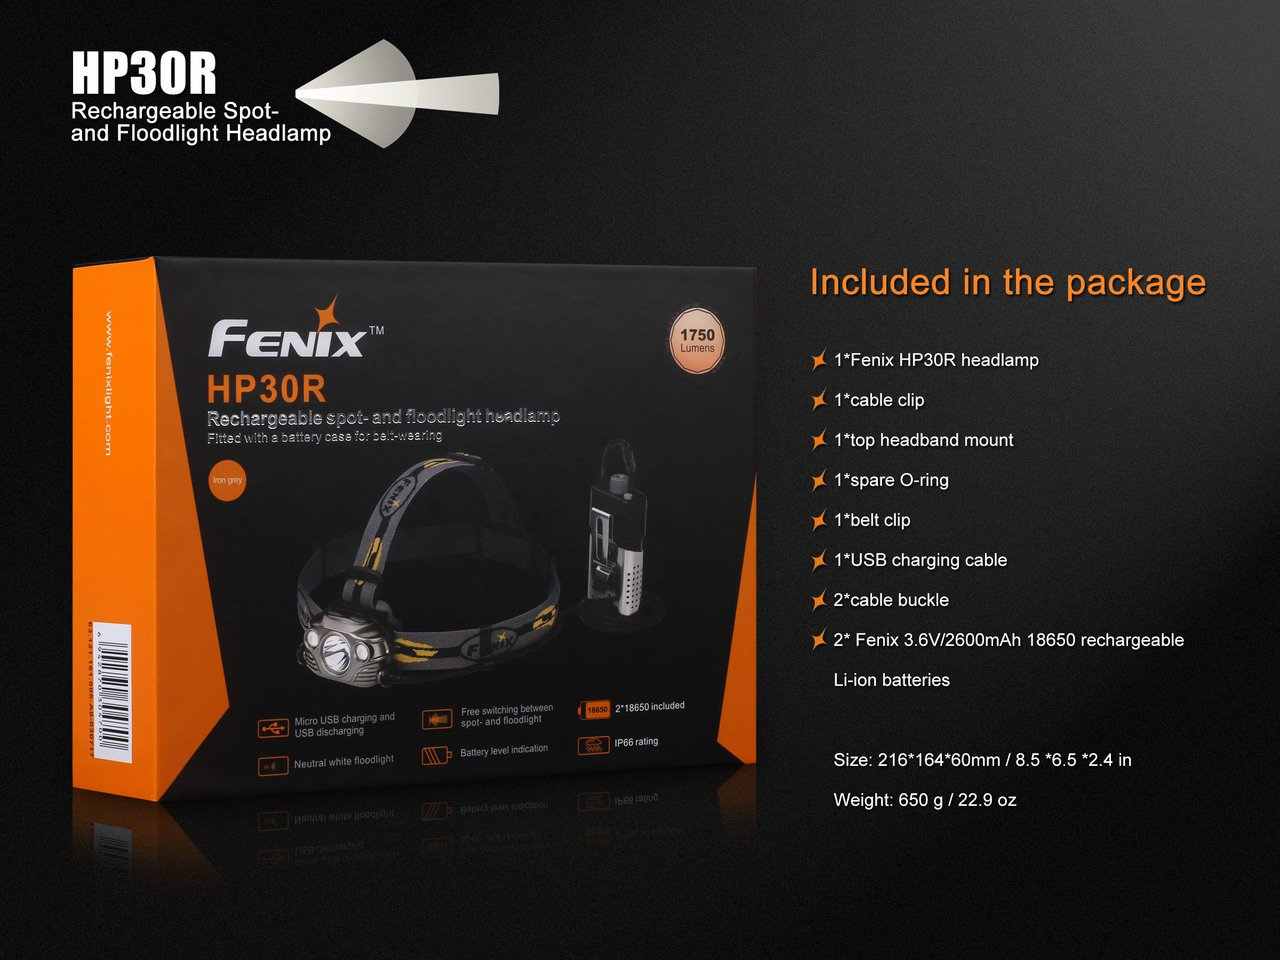 Fenix HP30R 1750 Lumen CREE LED Headlamp (Iron Grey) with 2 X Fenix 18650 Li-ion rechargeable batteries and Four EdisonBright CR123A Lithium batteries bundle by Fenix (Image #8)